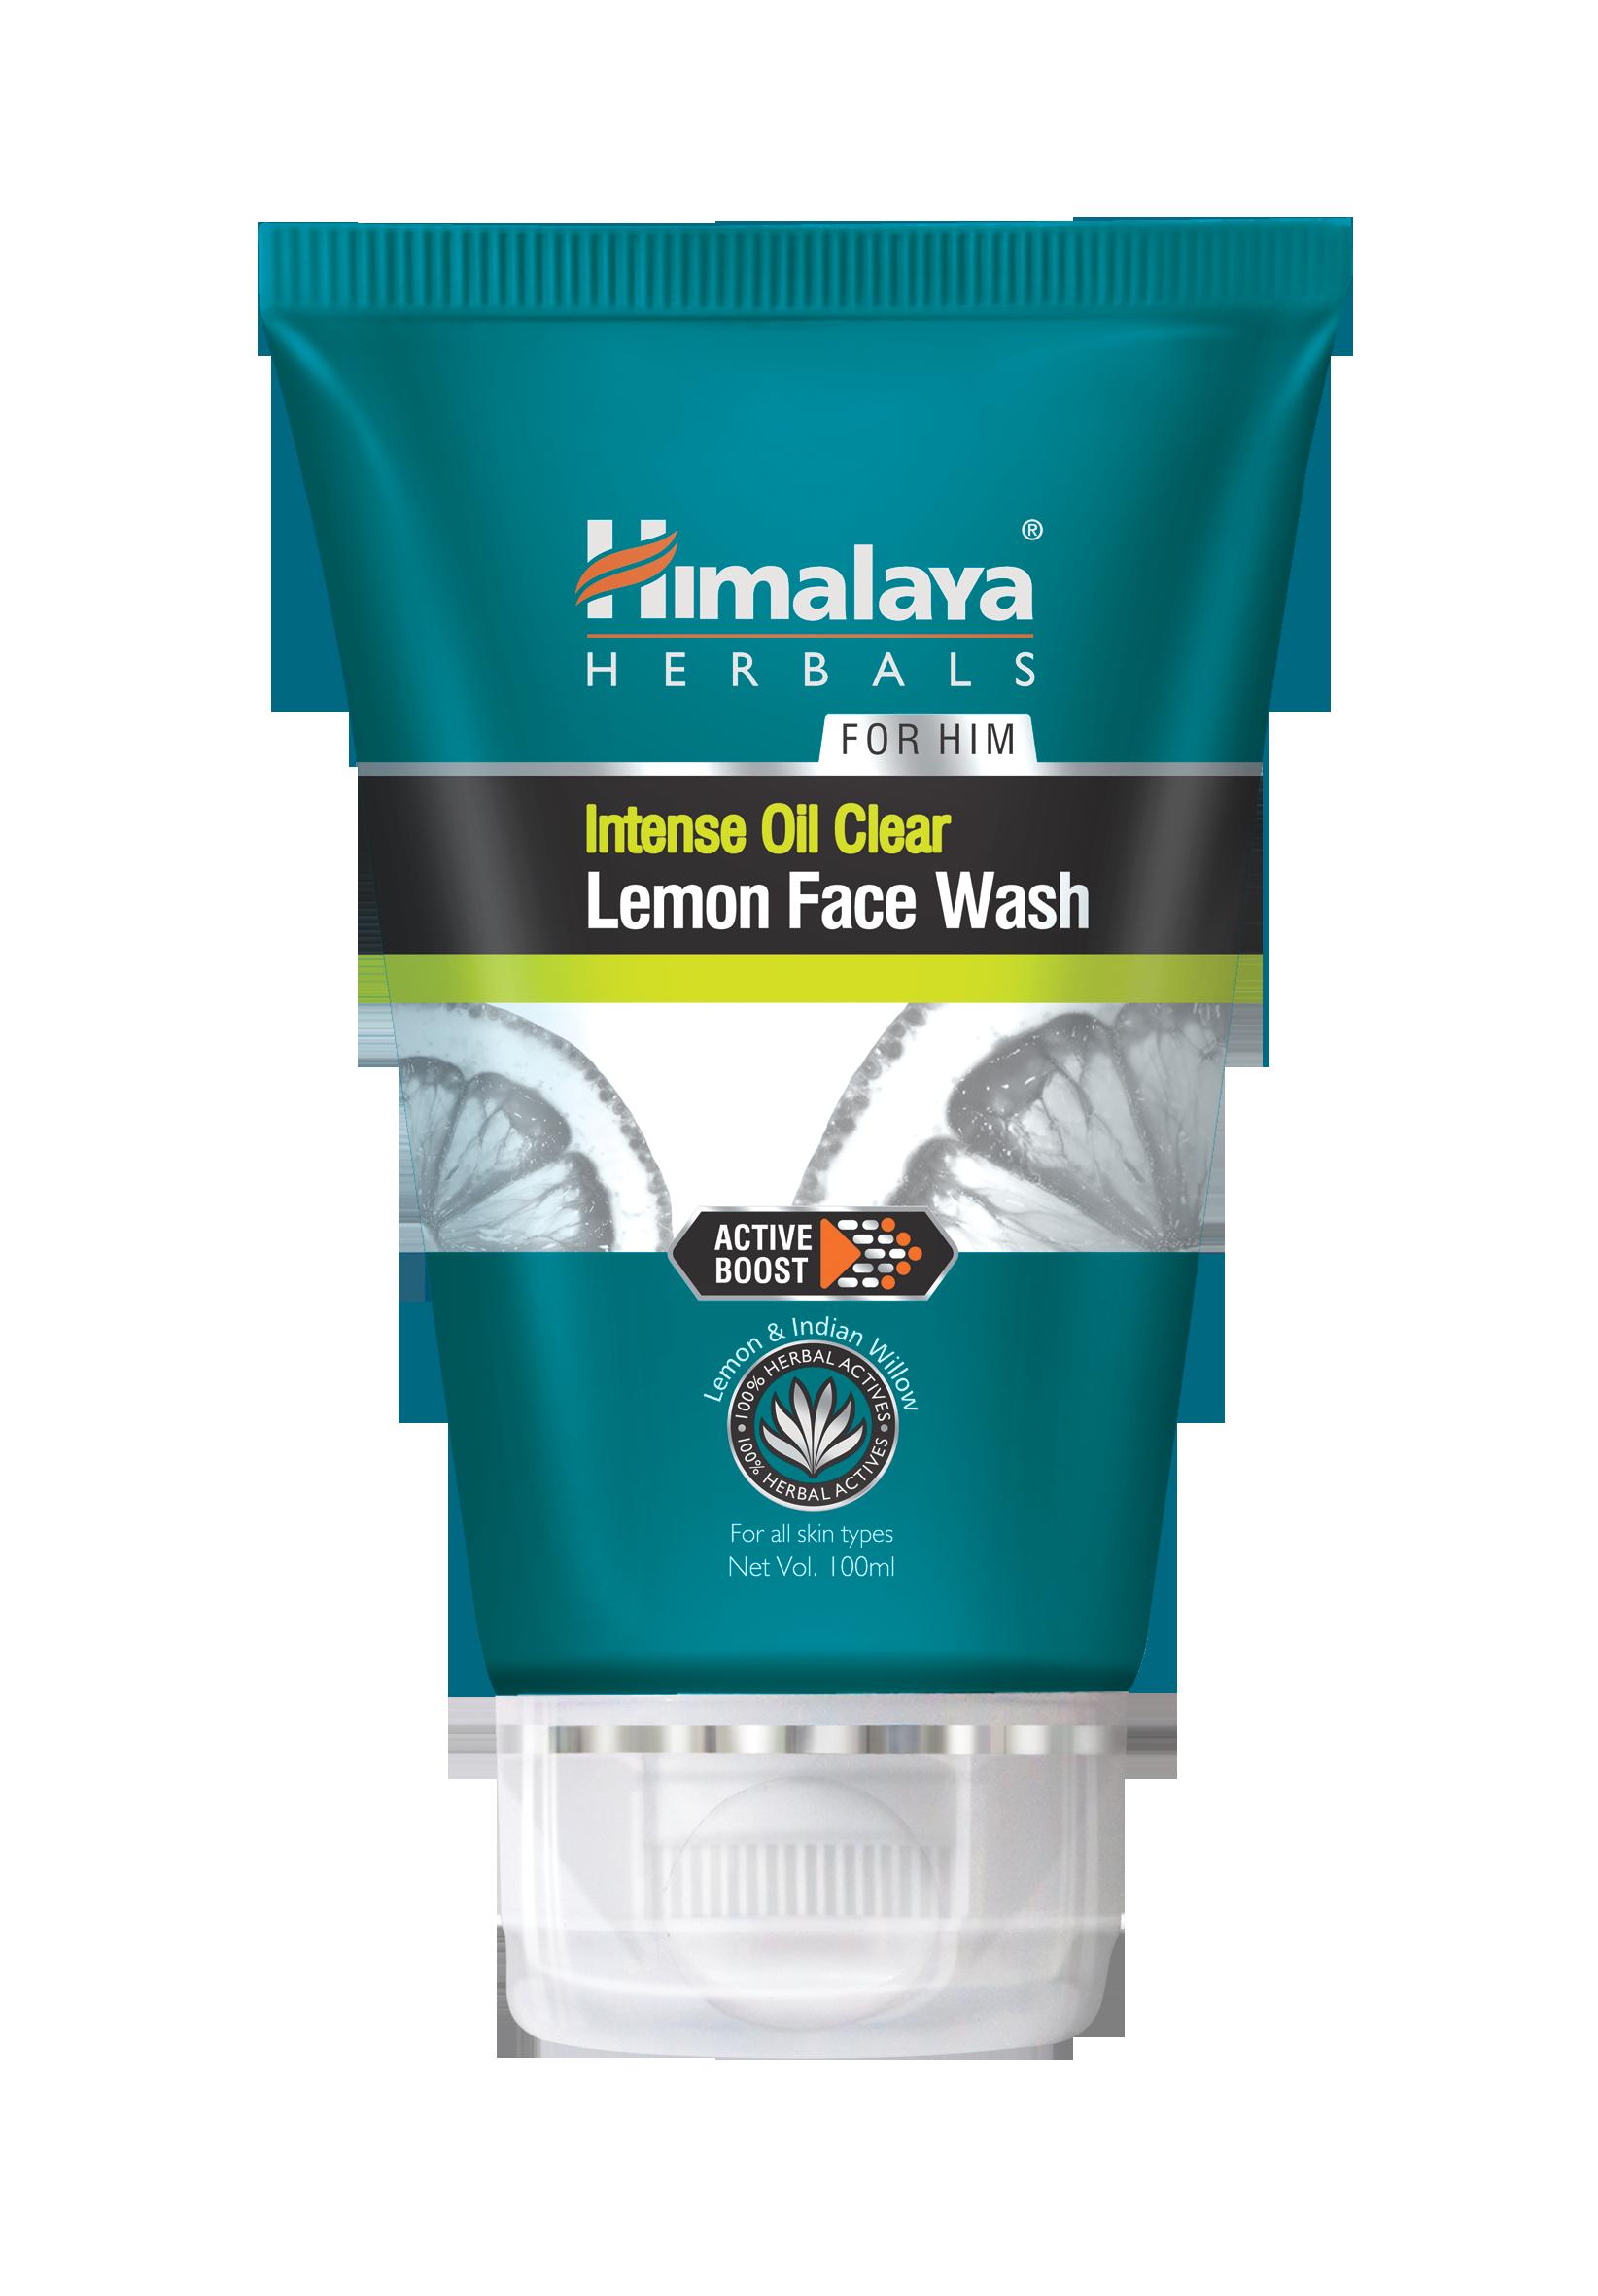 Himalaya_Intense Oil Clear Lemon Face Wash